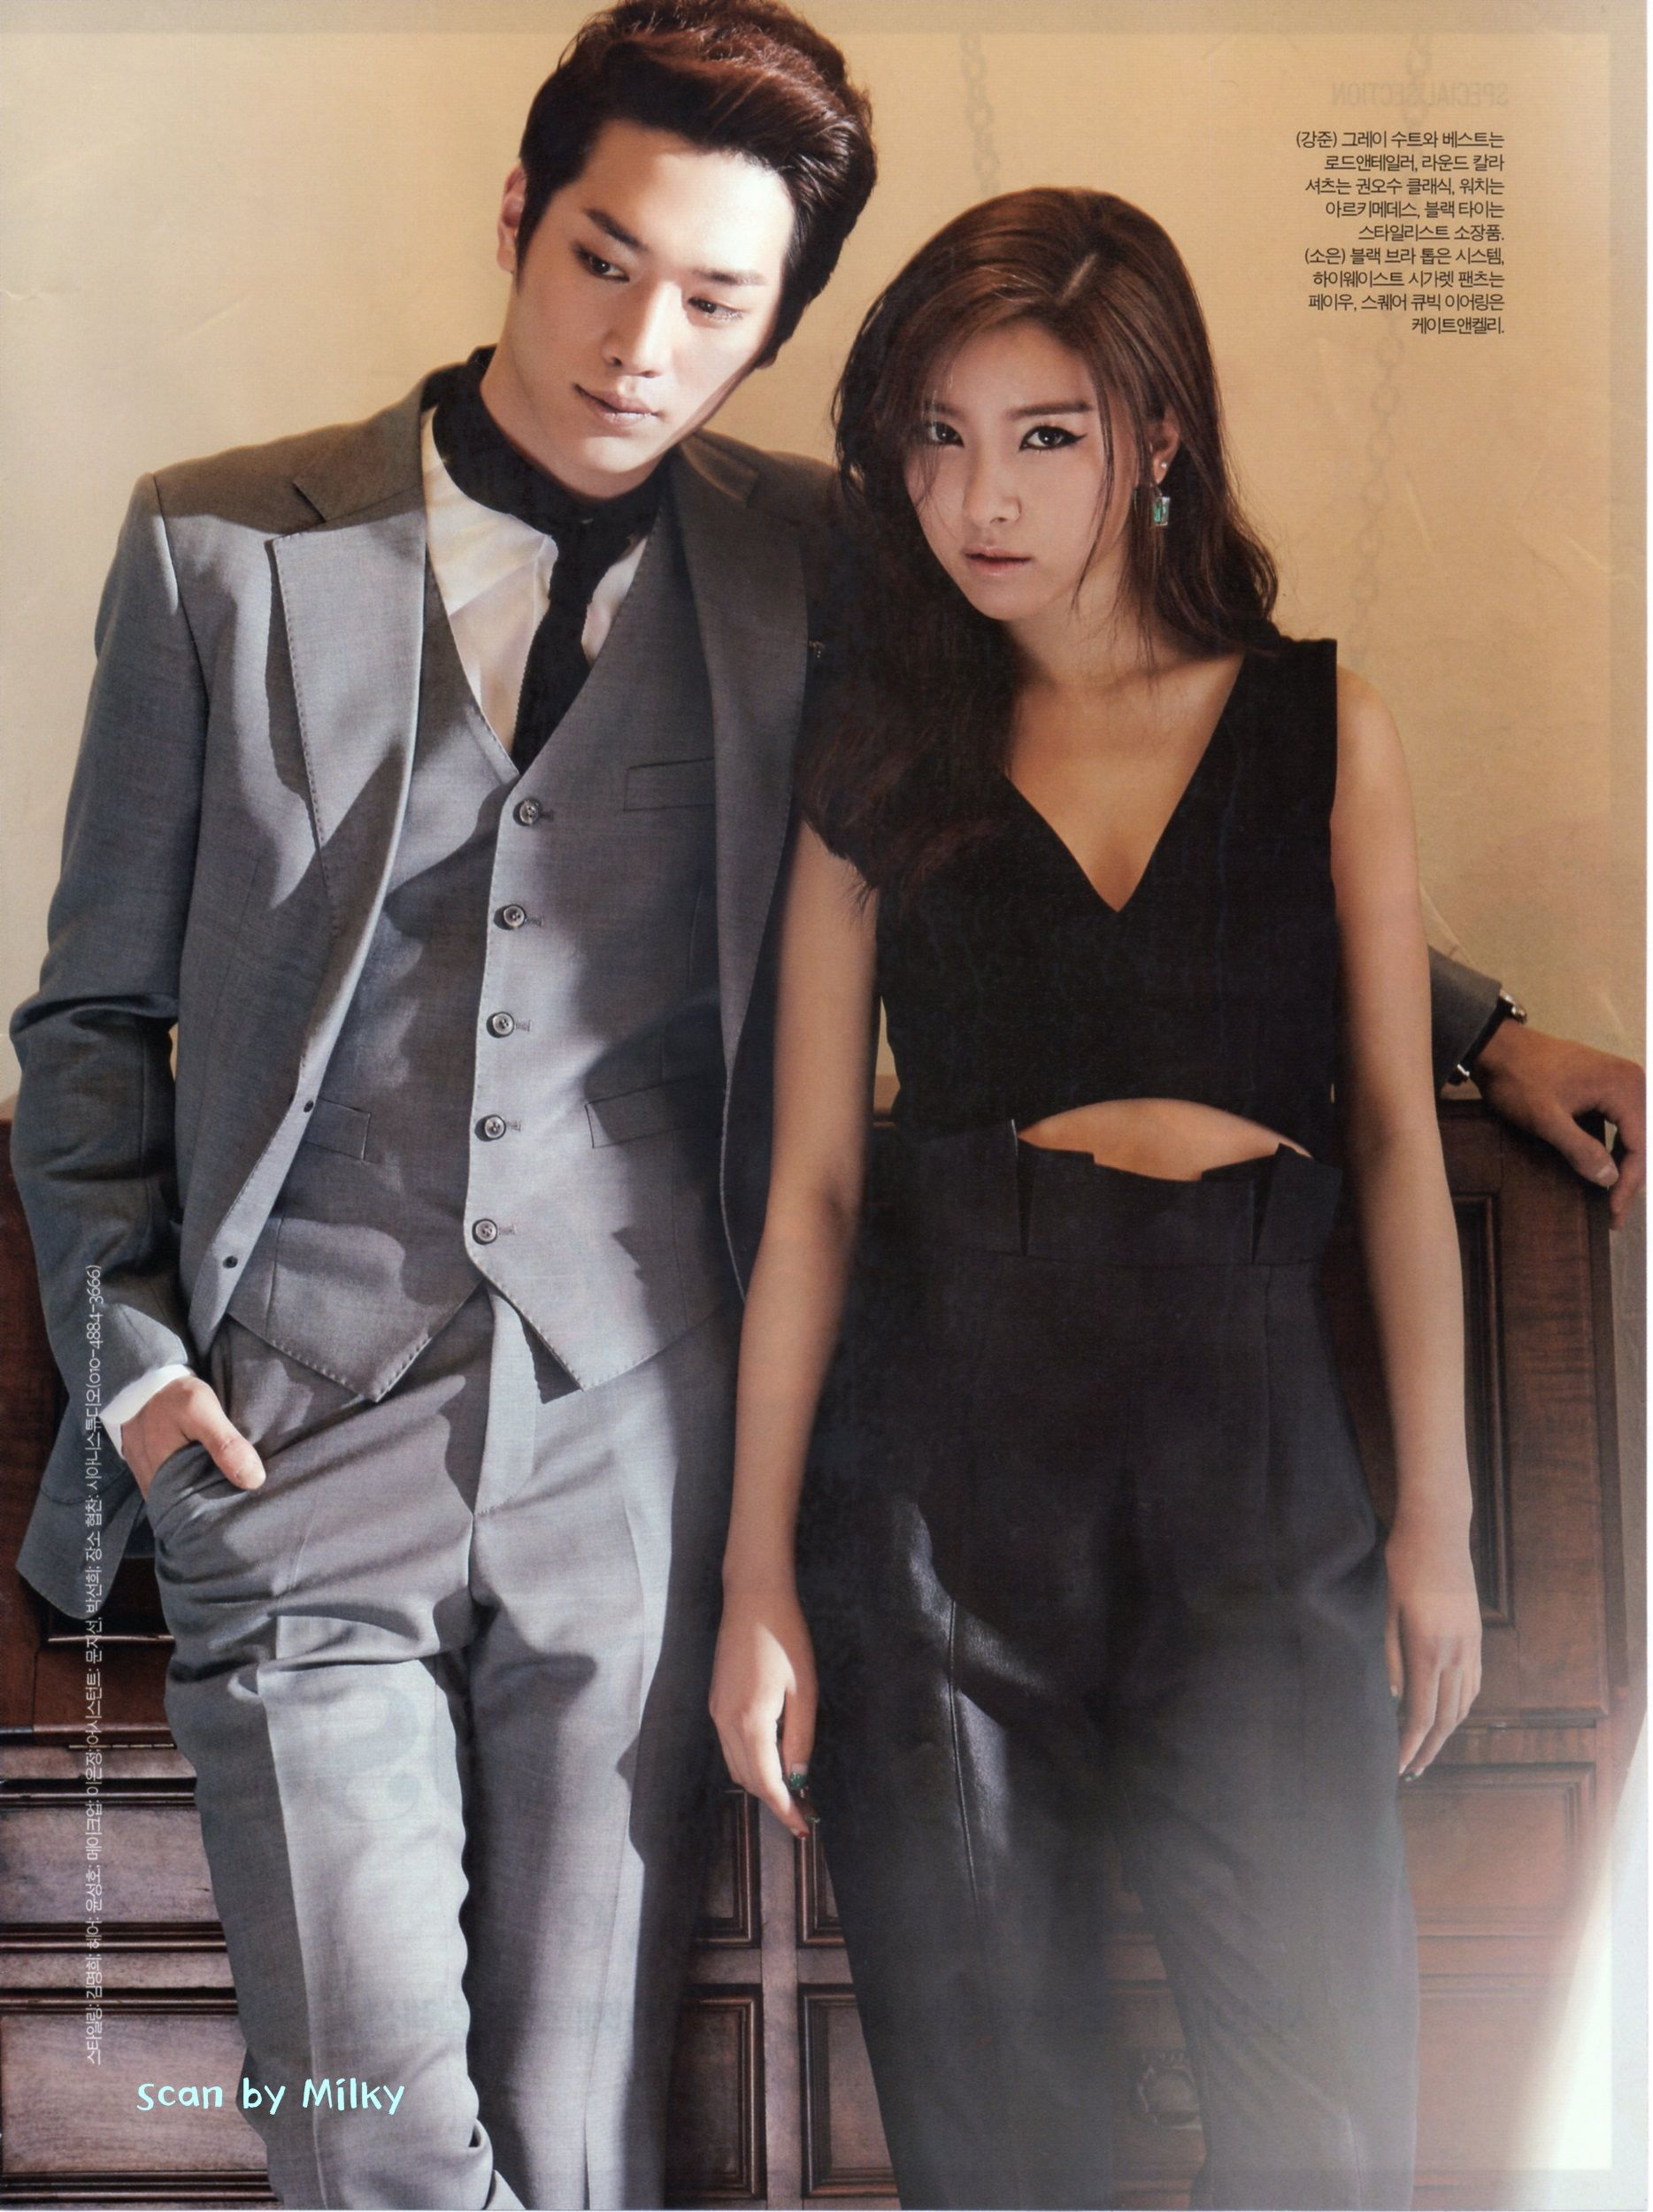 Kim so eun and shin se kyung dating